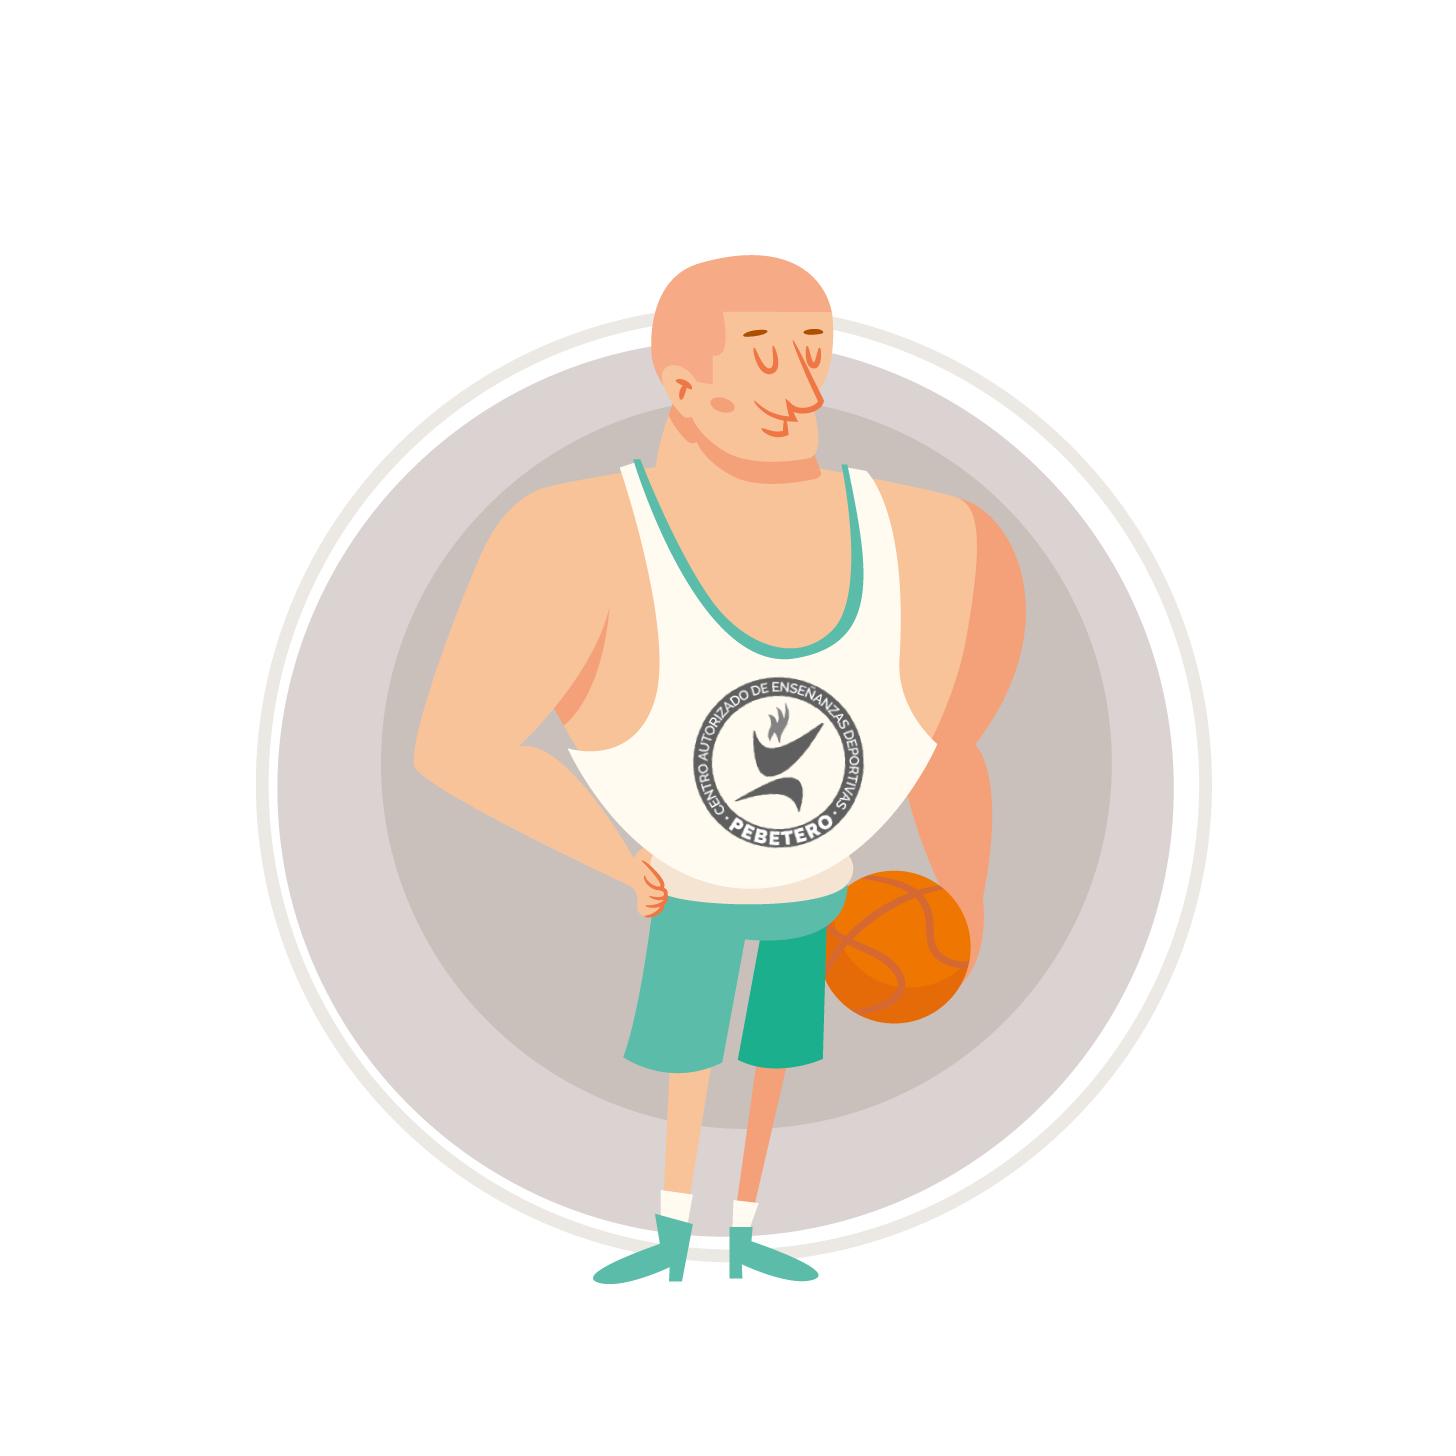 tecnico-deportivo-baloncesto-alumno